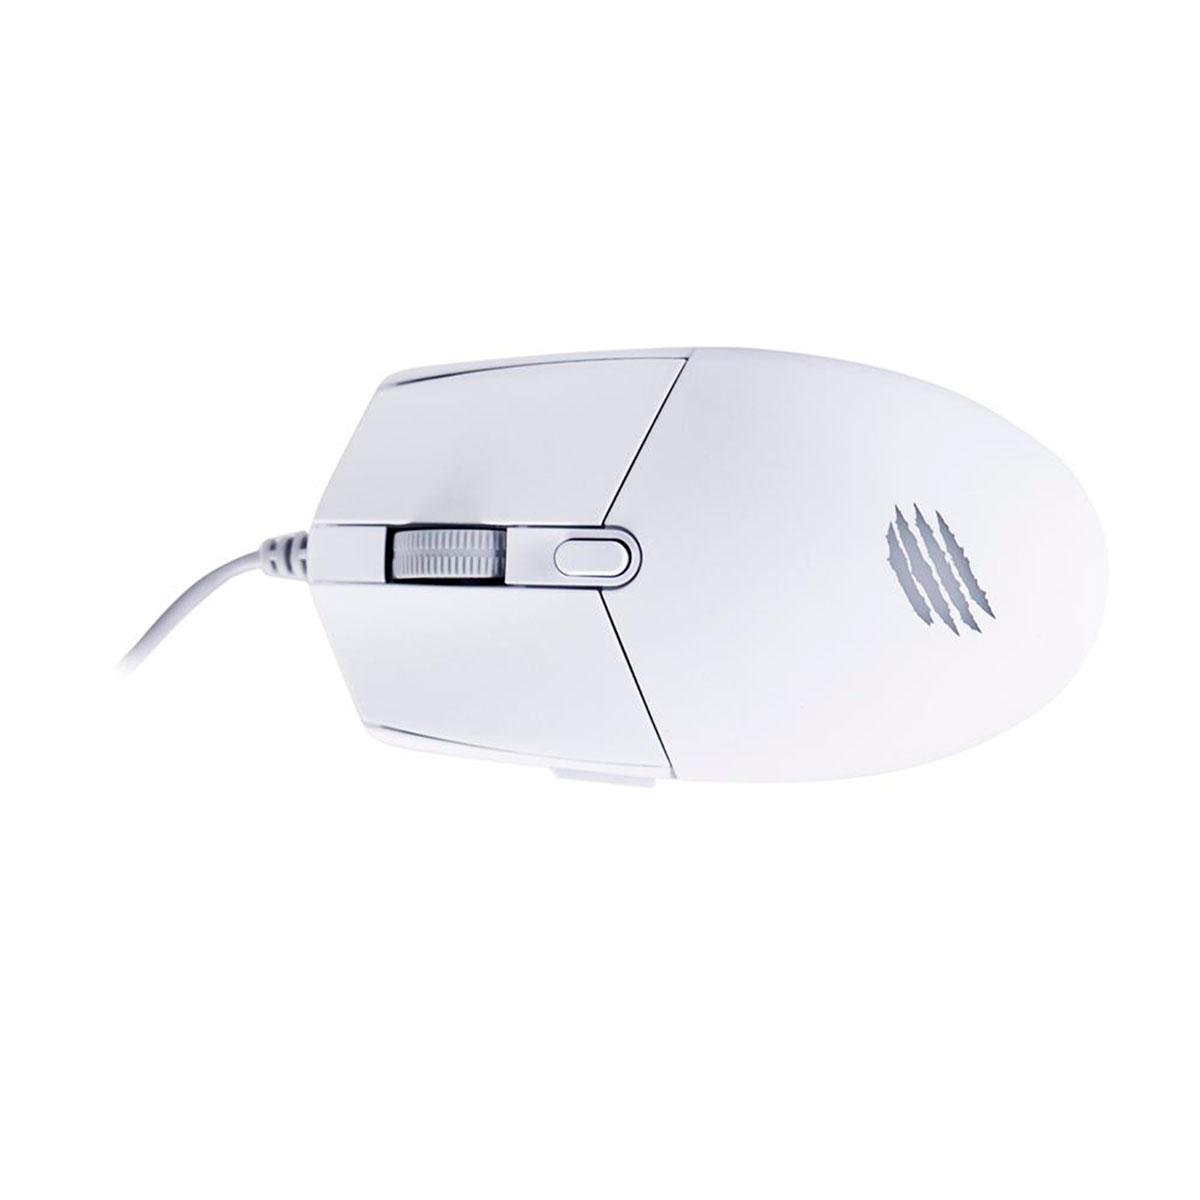 Mouse Gamer OEX Orium MS323, USB, 3200 DPI, LED Rainbow, 6 Botões, Branco